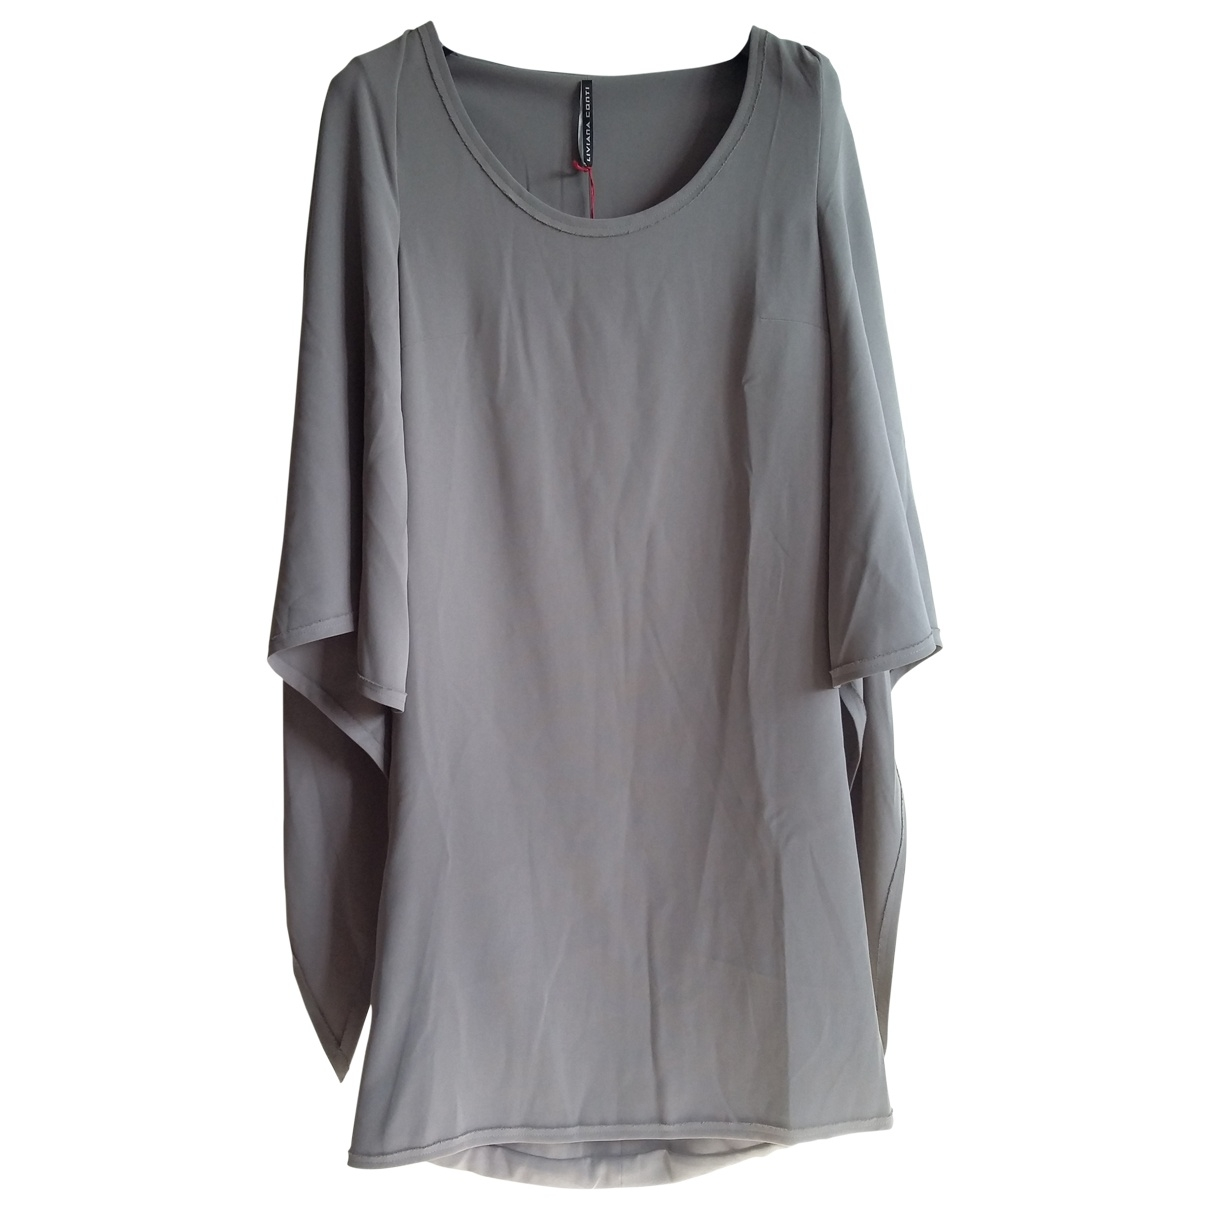 Liviana Conti \N Kleid in  Grau Polyester